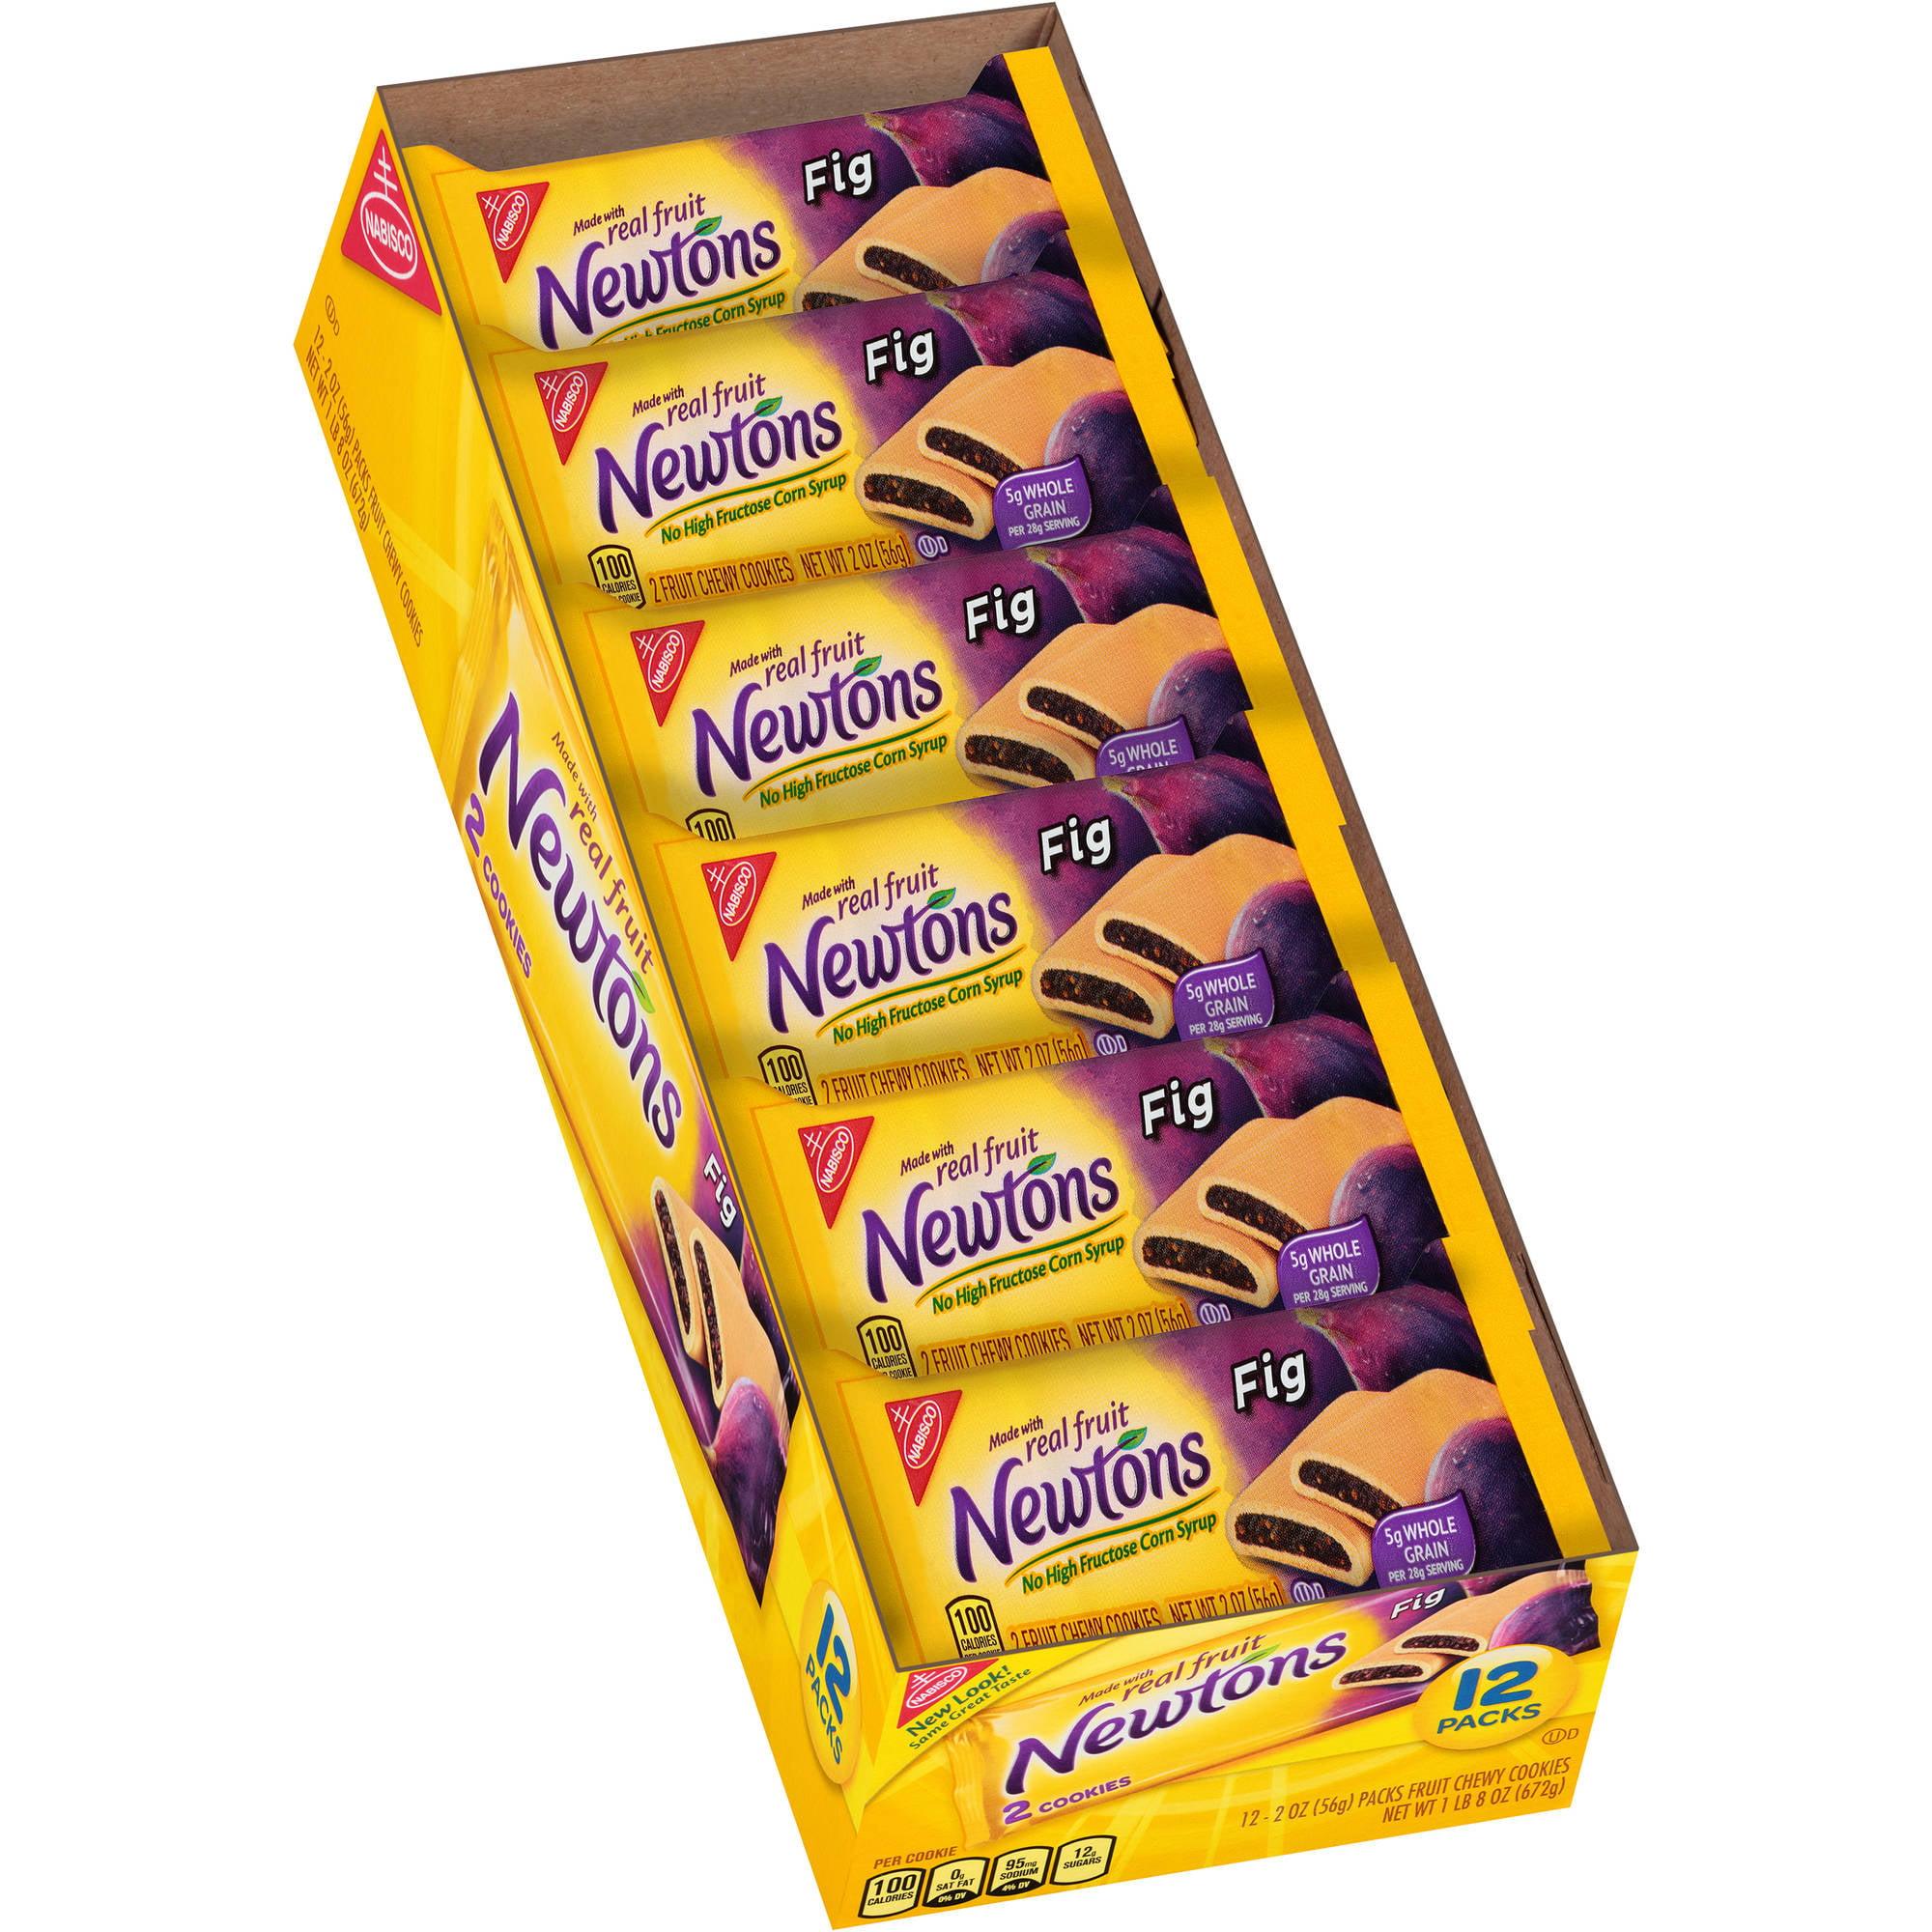 Kraft Foods Snacks & Cereal Mondelez Global Llc Nabisco Newtons Fig Fruit Chewy Cookies  -  12 Ct